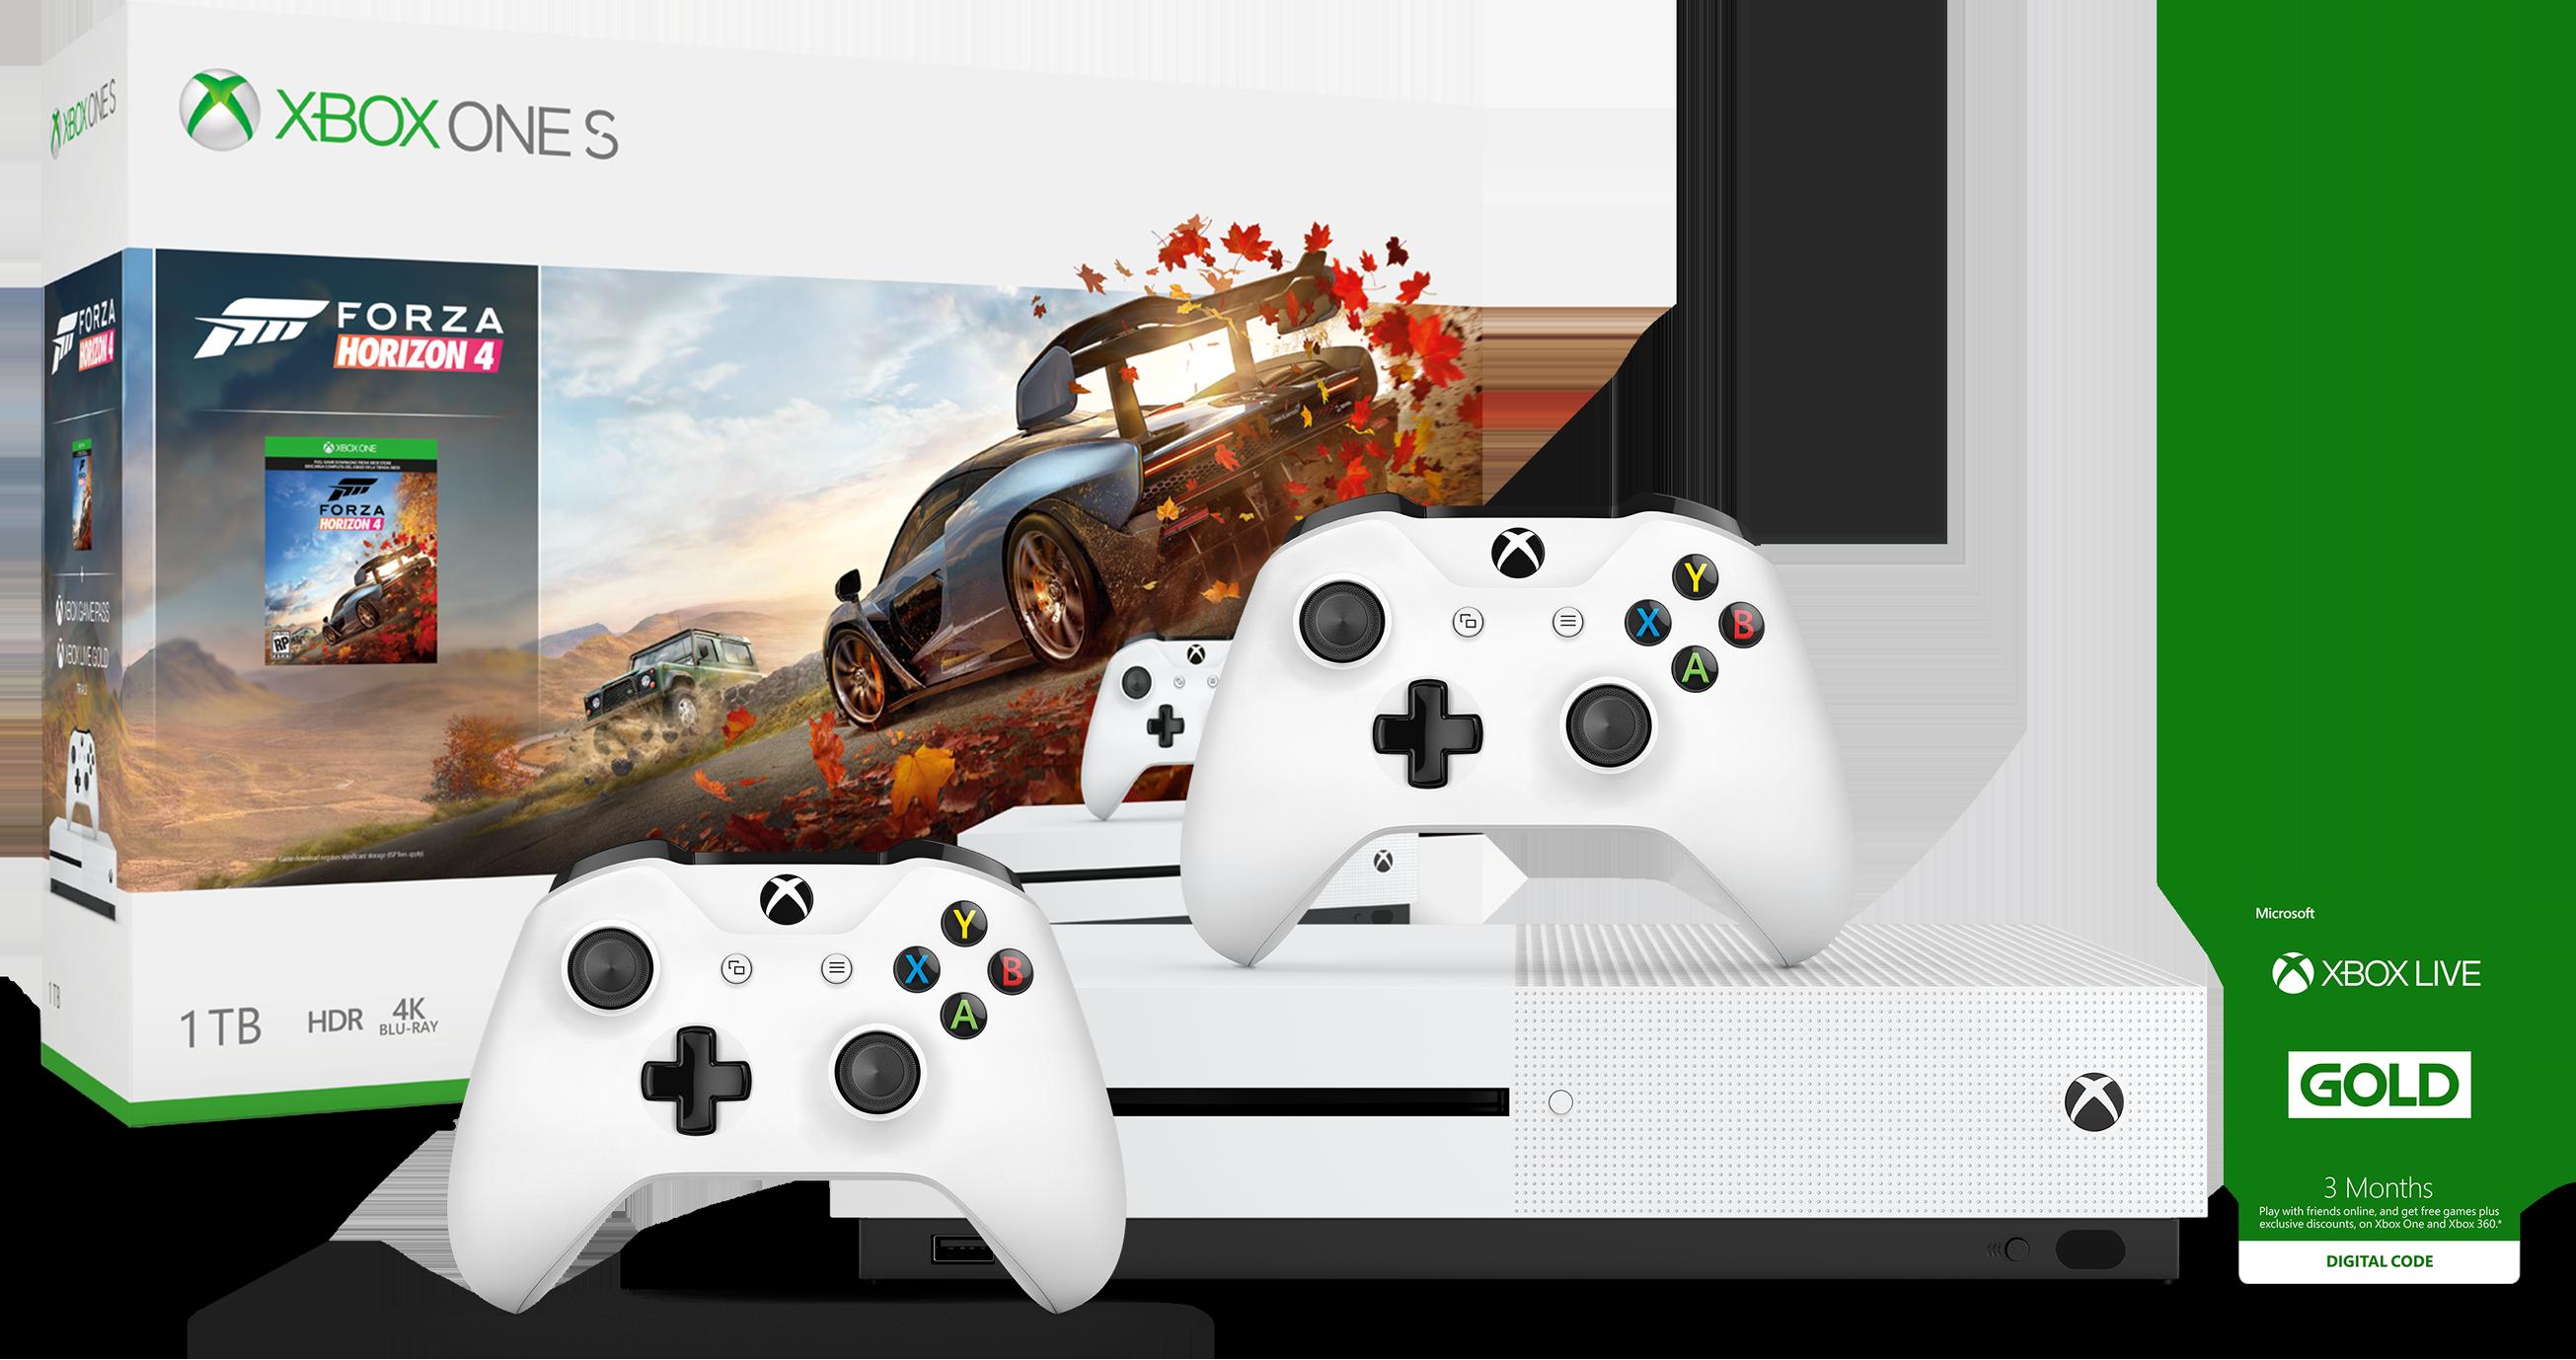 Pack console Xbox One X + Forza Horizon 4 + Manette Xbox sans fil blanche + Abonnement Xbox Live Gold